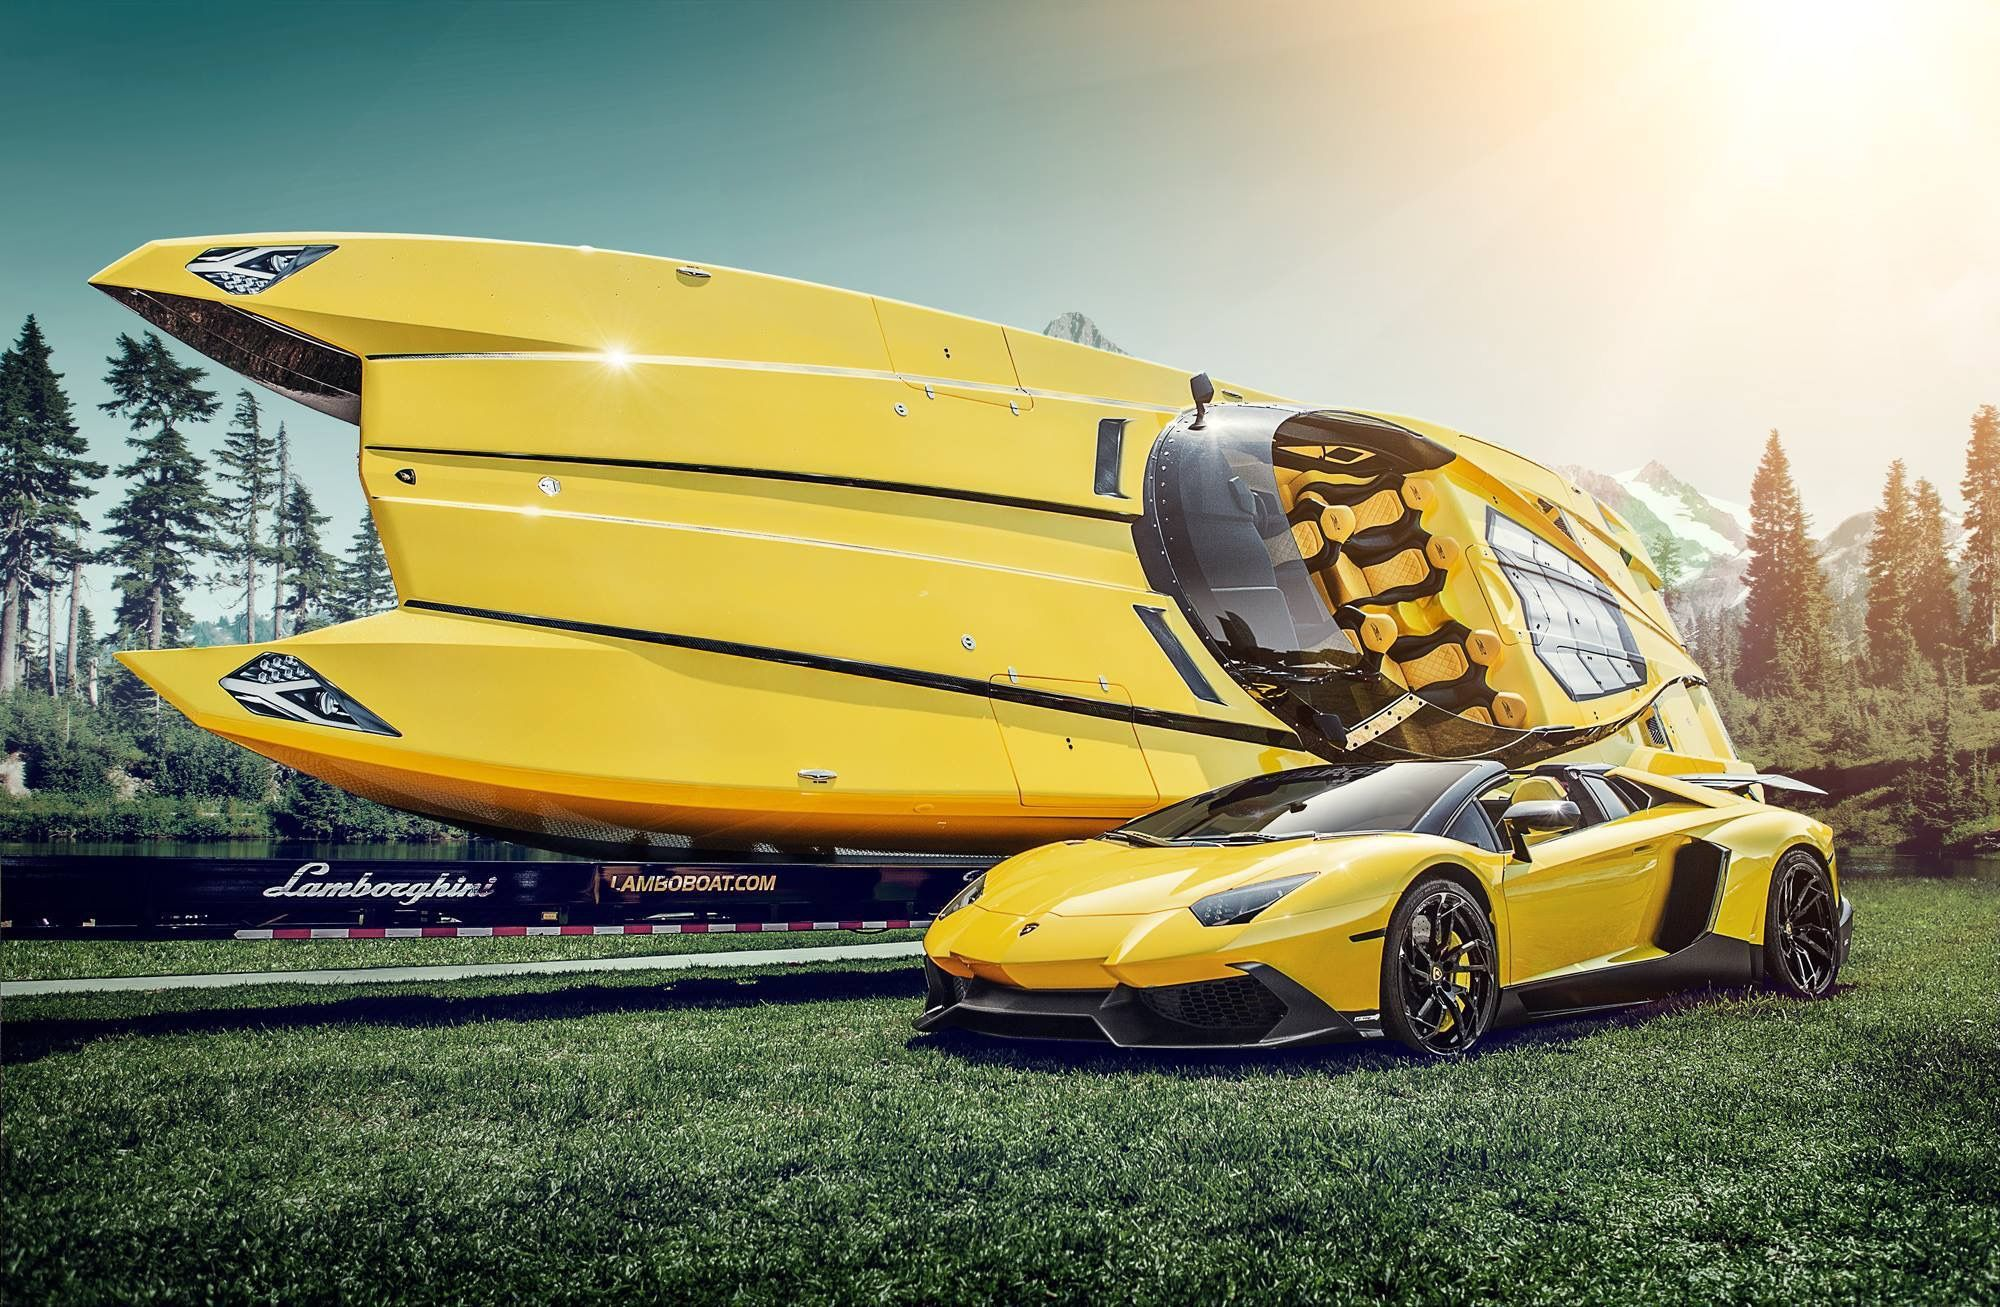 Lamborghini Aventador Roadster And Race Boat It Is A Looker